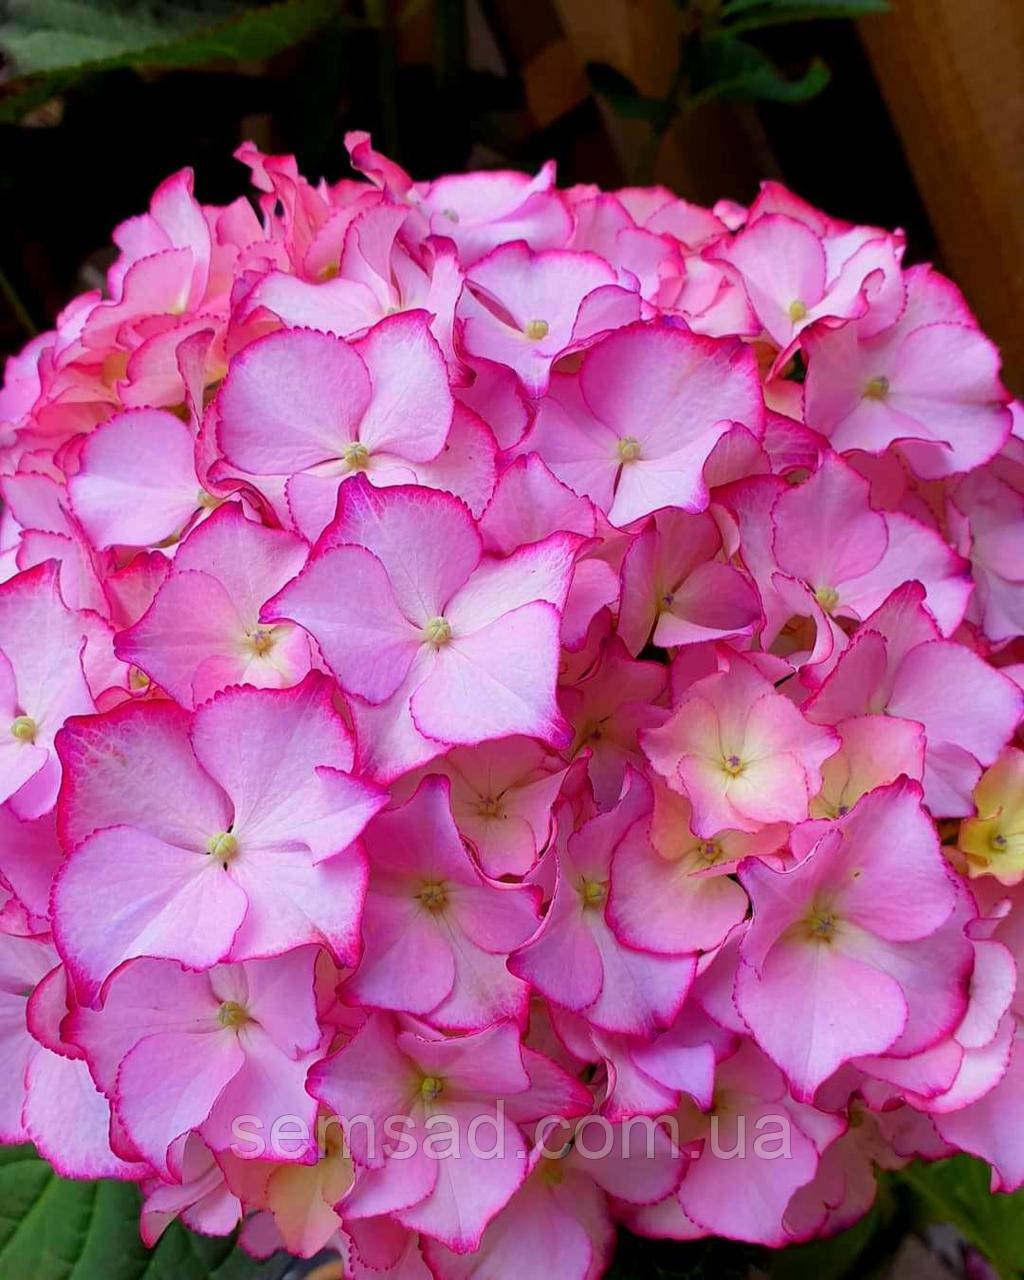 "Гортензия крупнолистная "" Мираи"" \ Hydrangea macrophylla Mirai   ( саженцы  )"